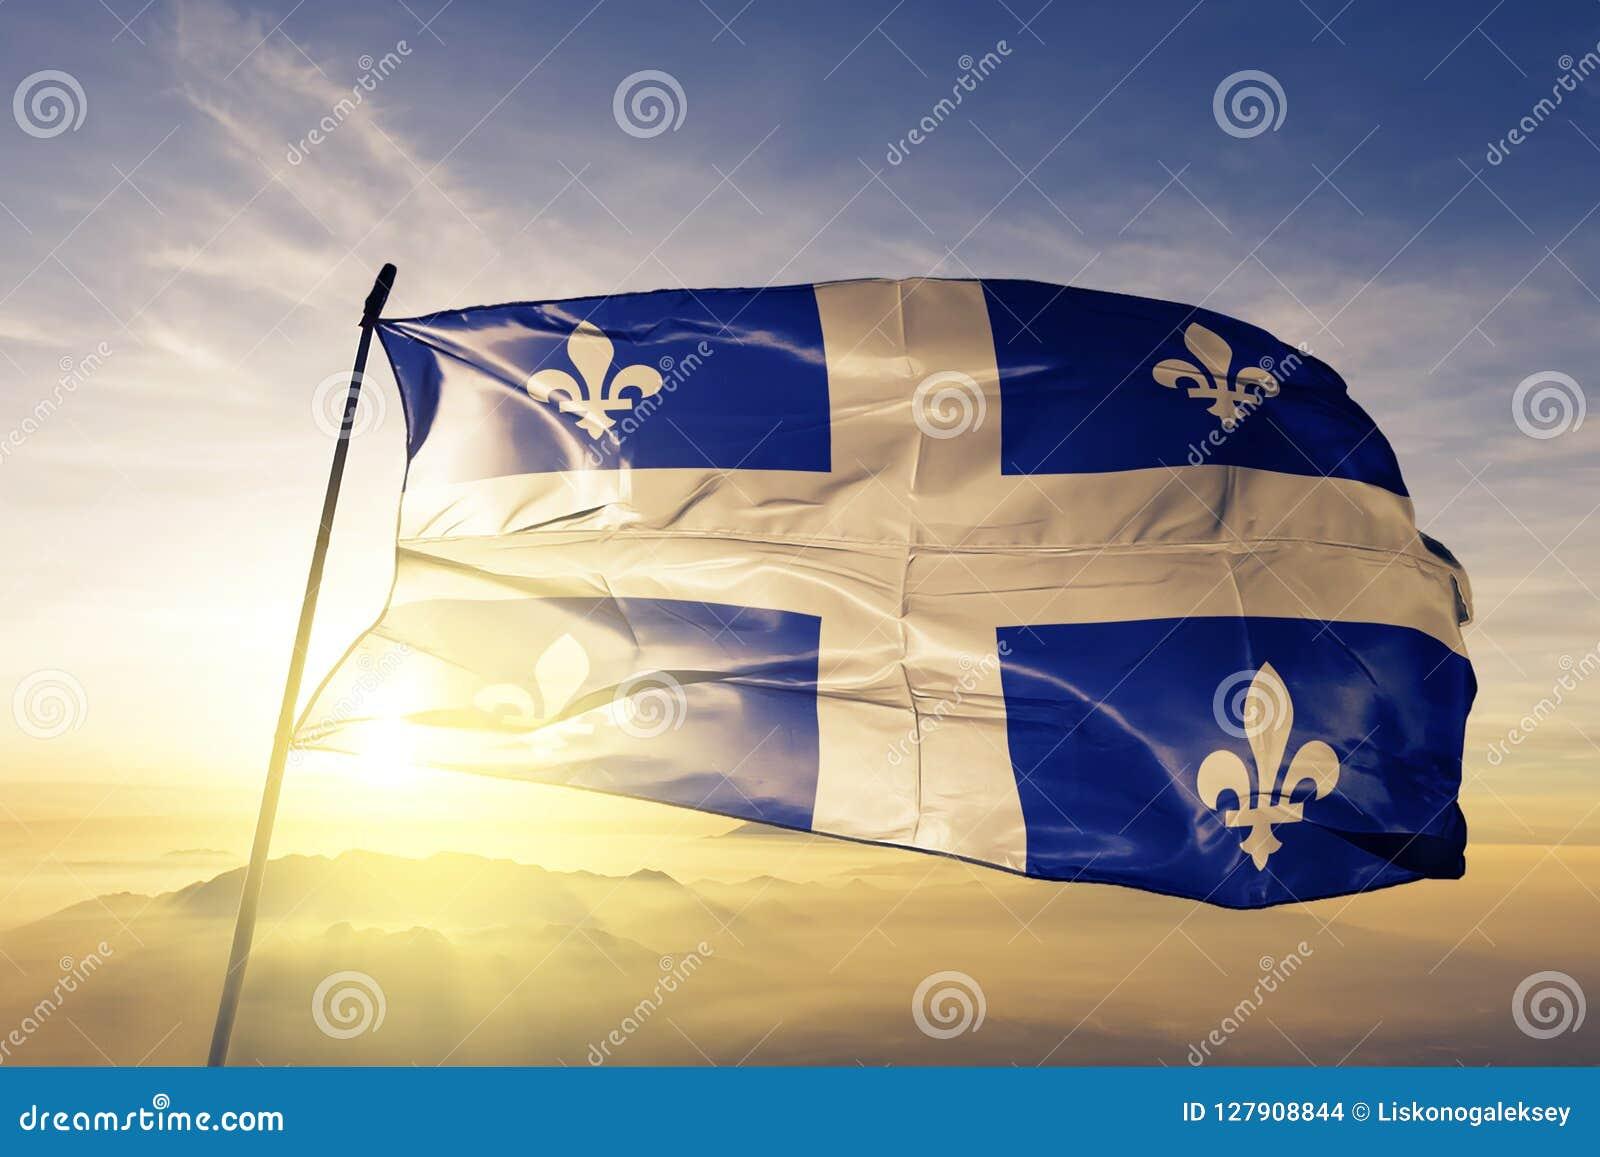 Quebec province of Canada flag textile cloth fabric waving on the top sunrise mist fog